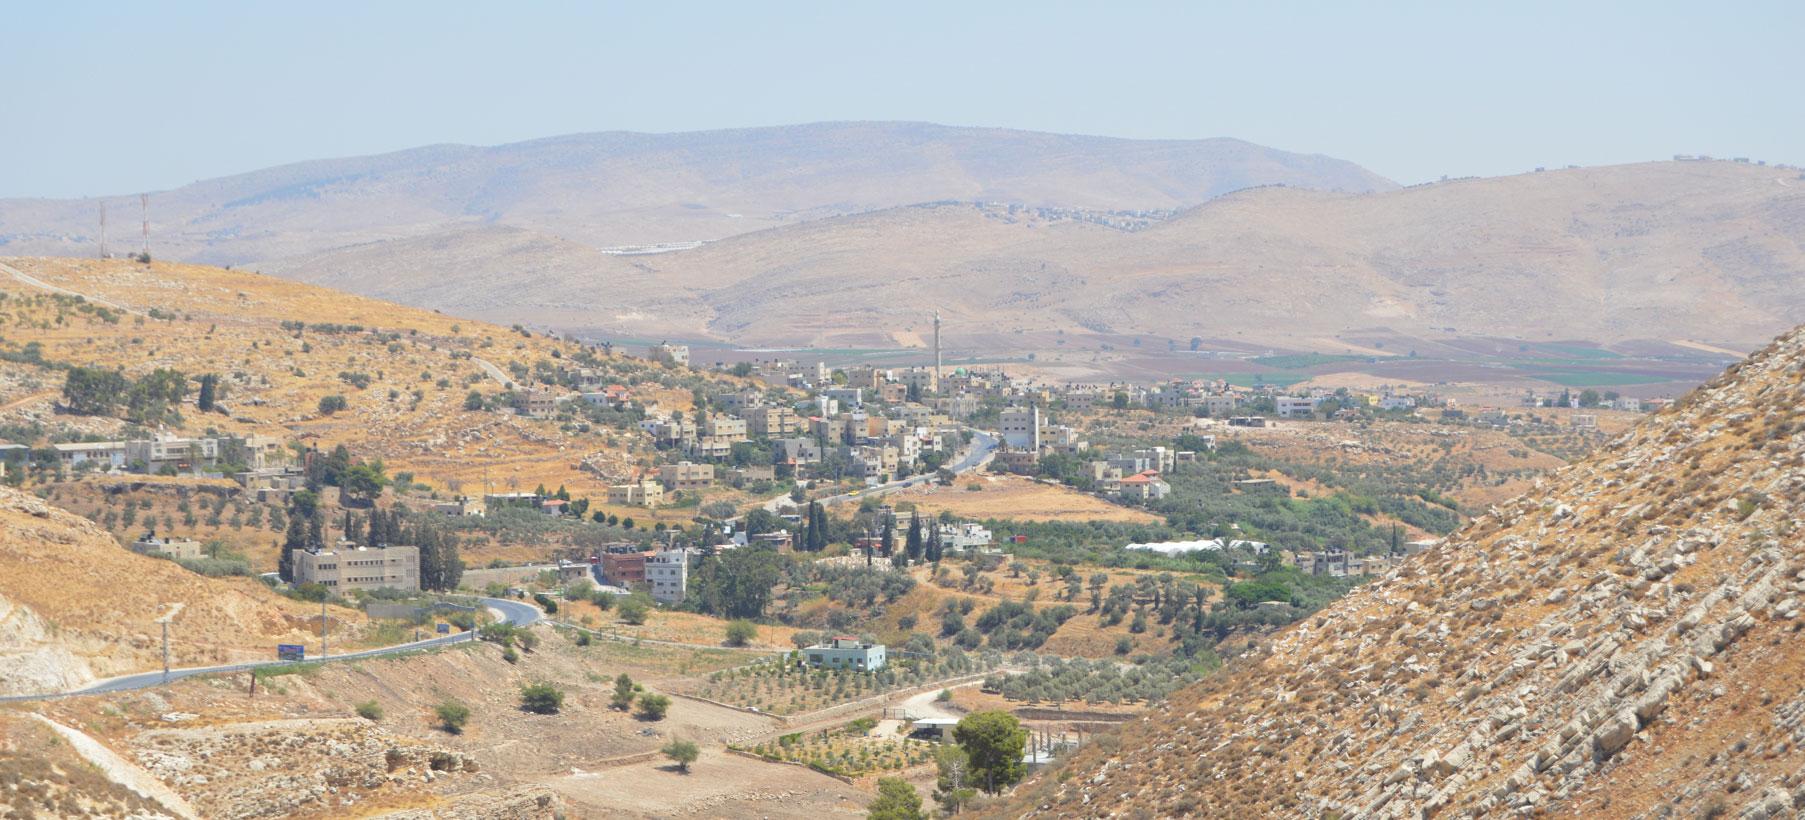 Wadi-al-Badan